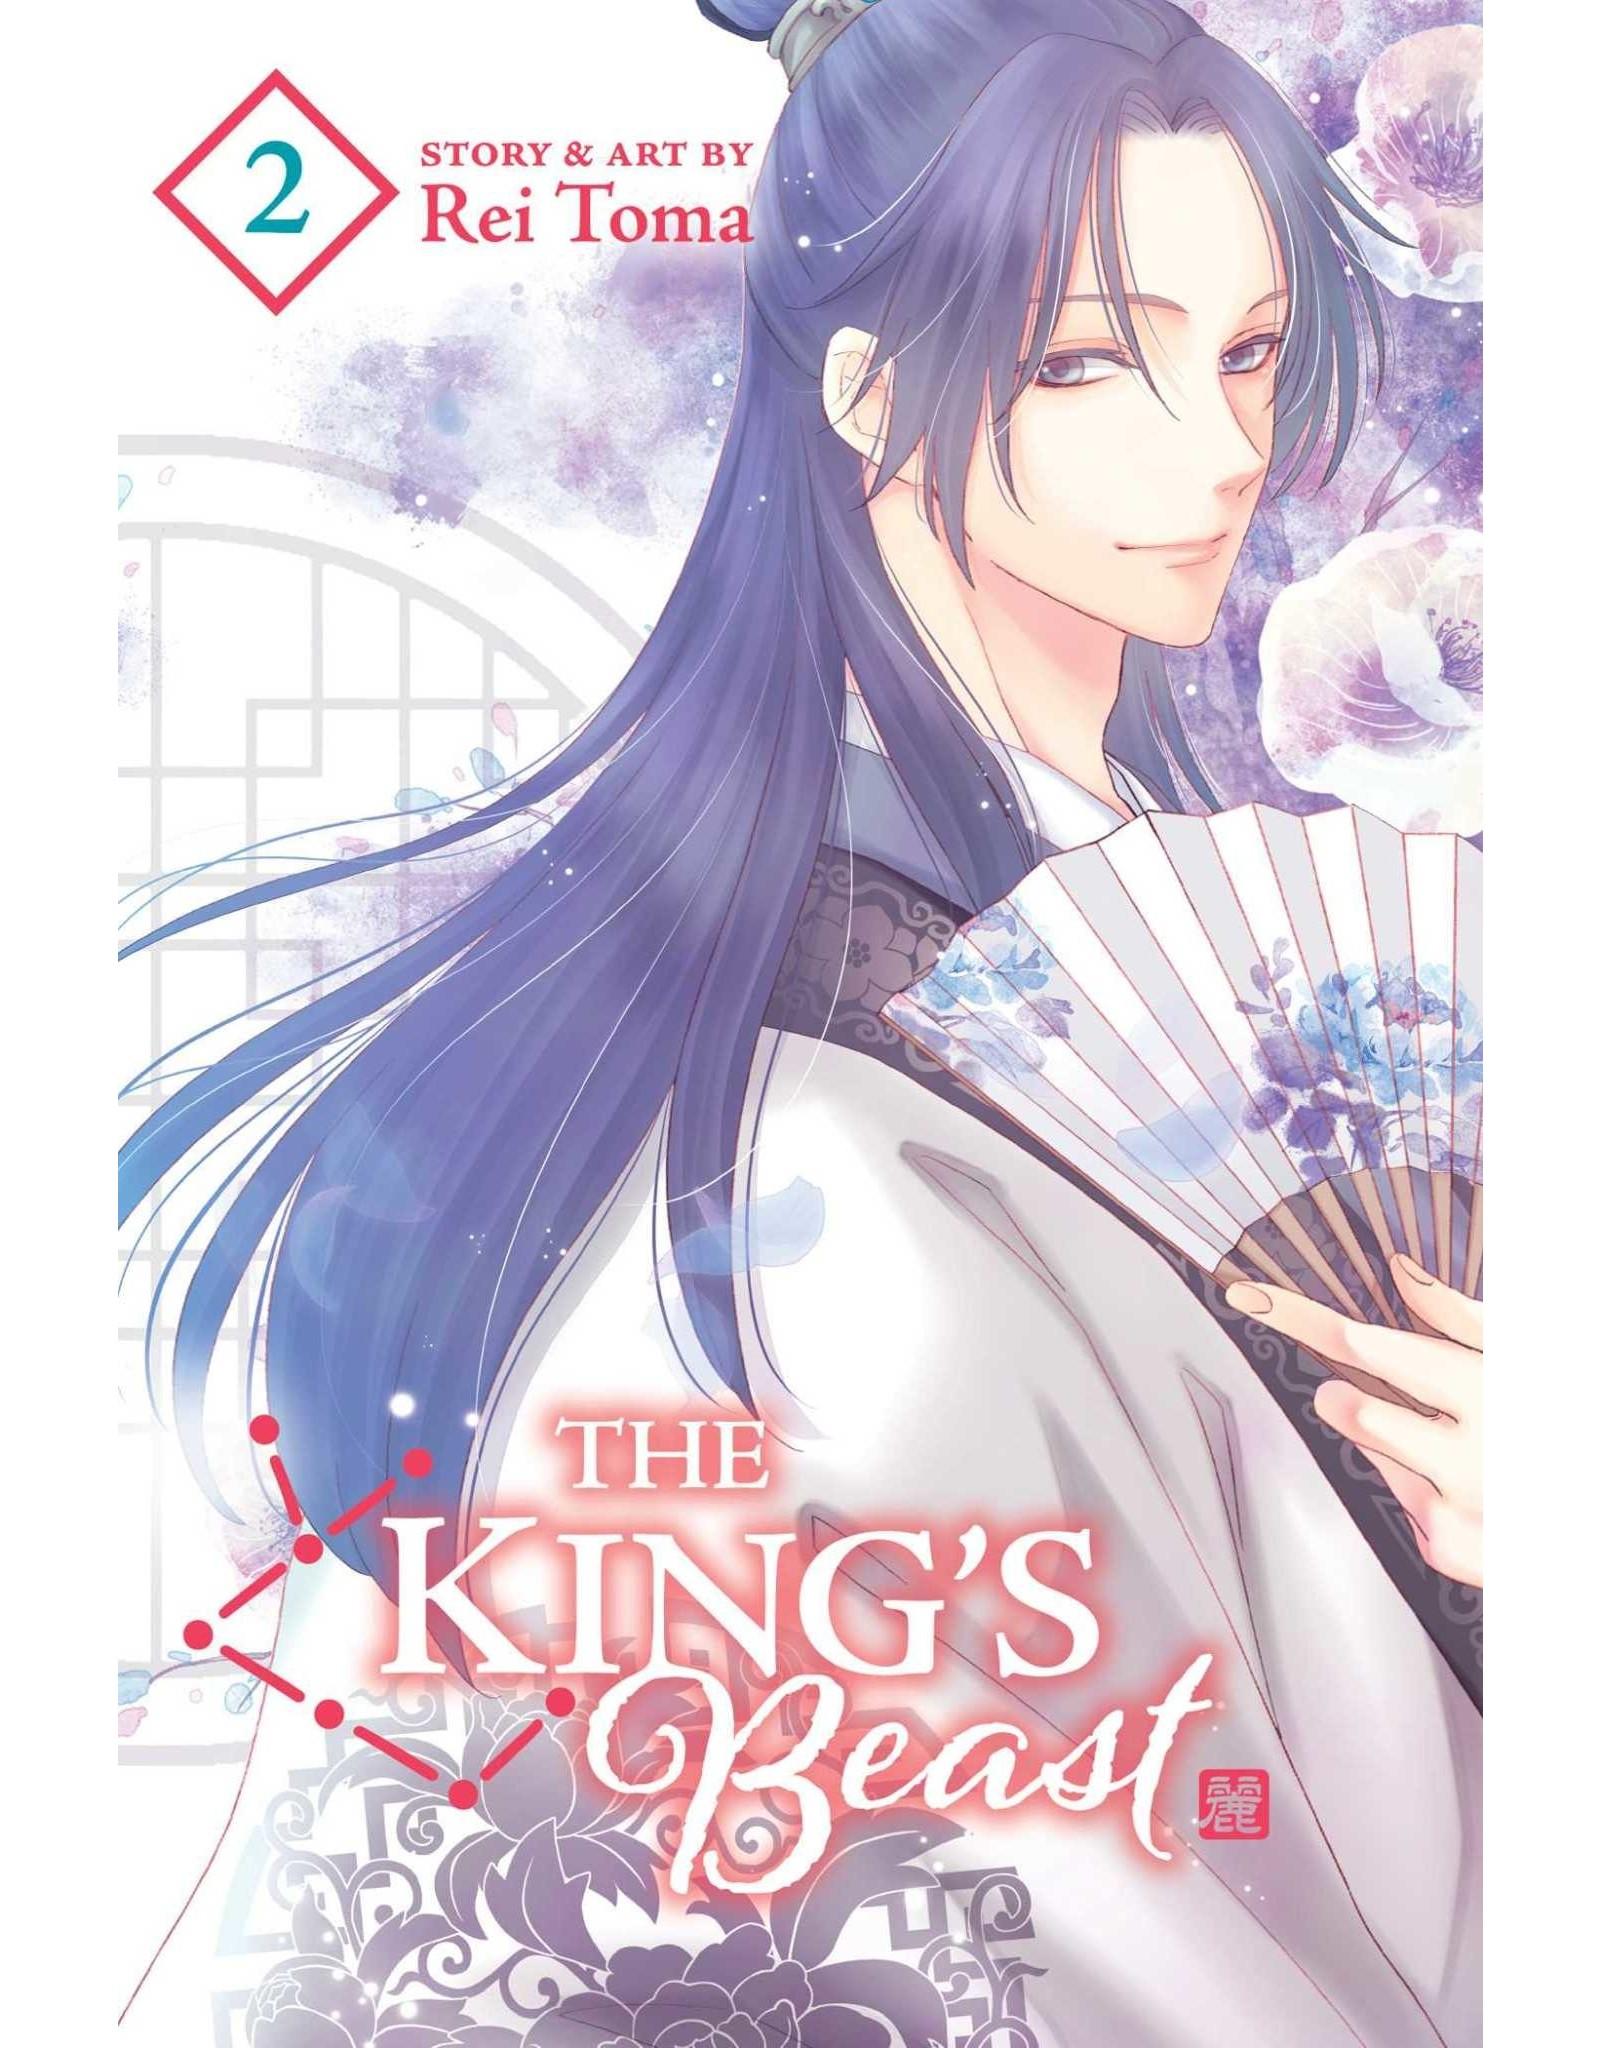 The King's Beast 2 (English) - Manga